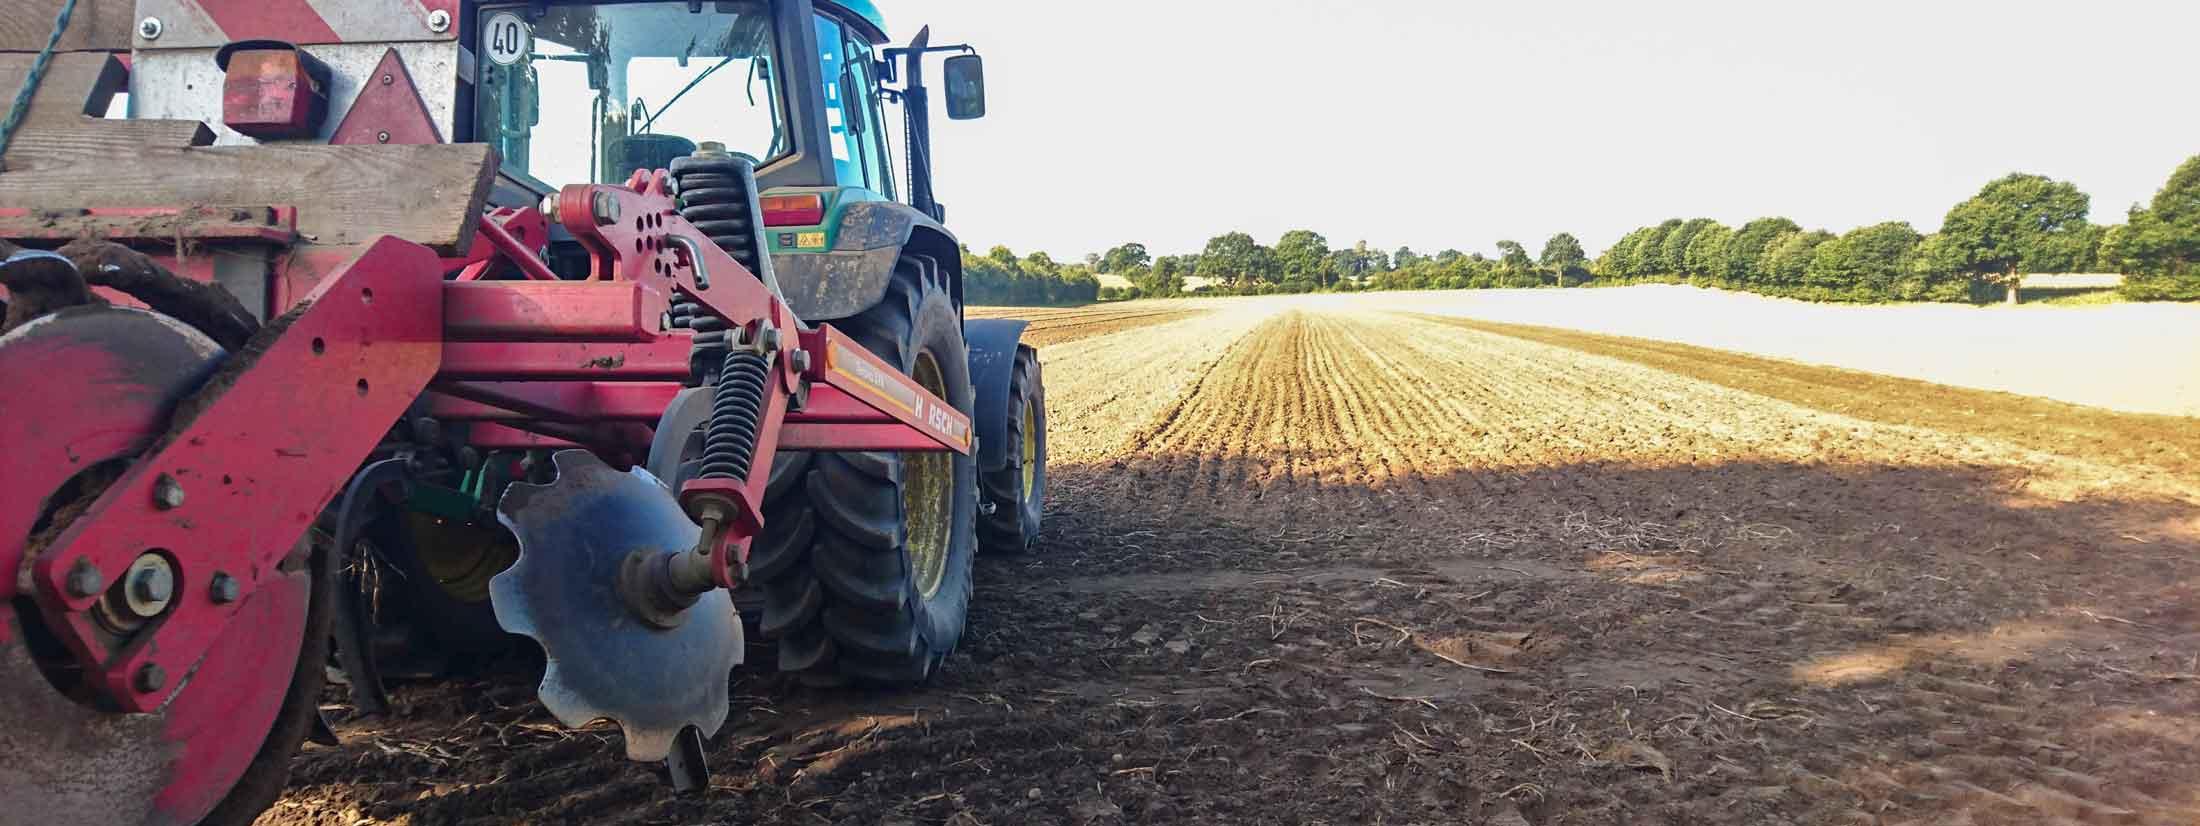 Landwirtschaft-Traktor-Egge-Feldarbeit